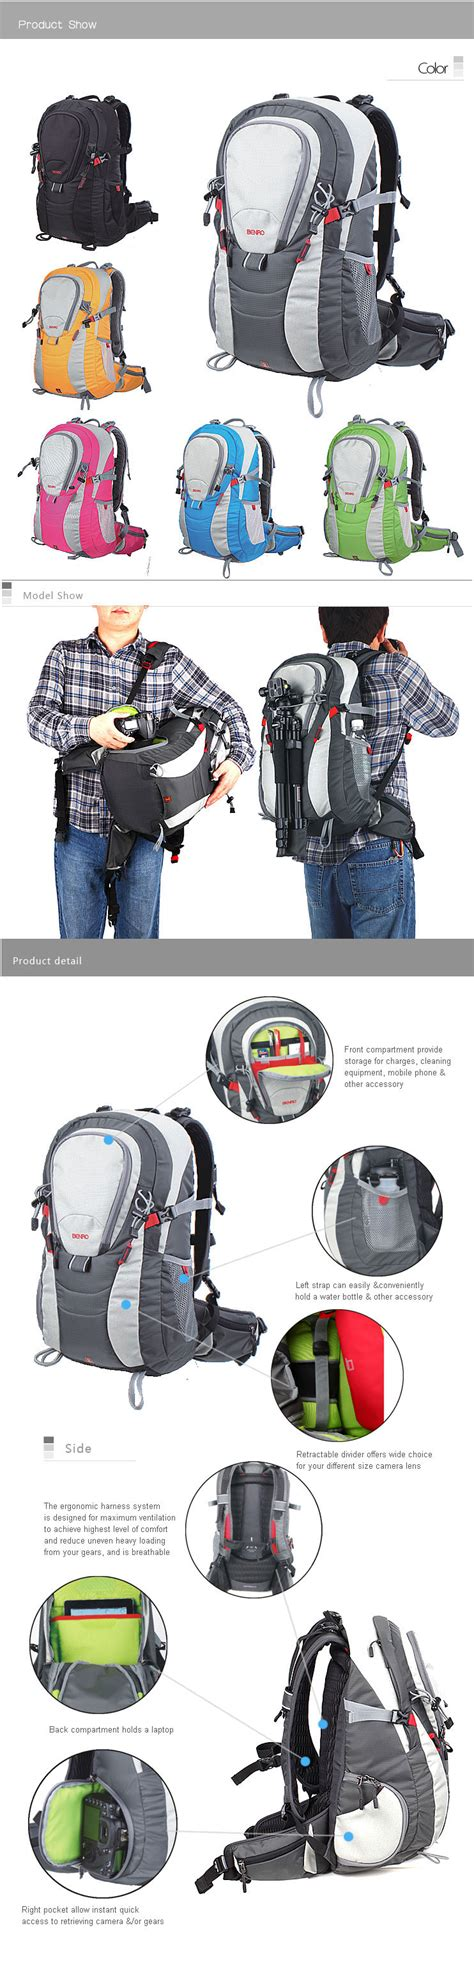 Benro Backpack Colorful 200 Black benro hummer 200 black hummer series backpack 32x28x56cm benro store